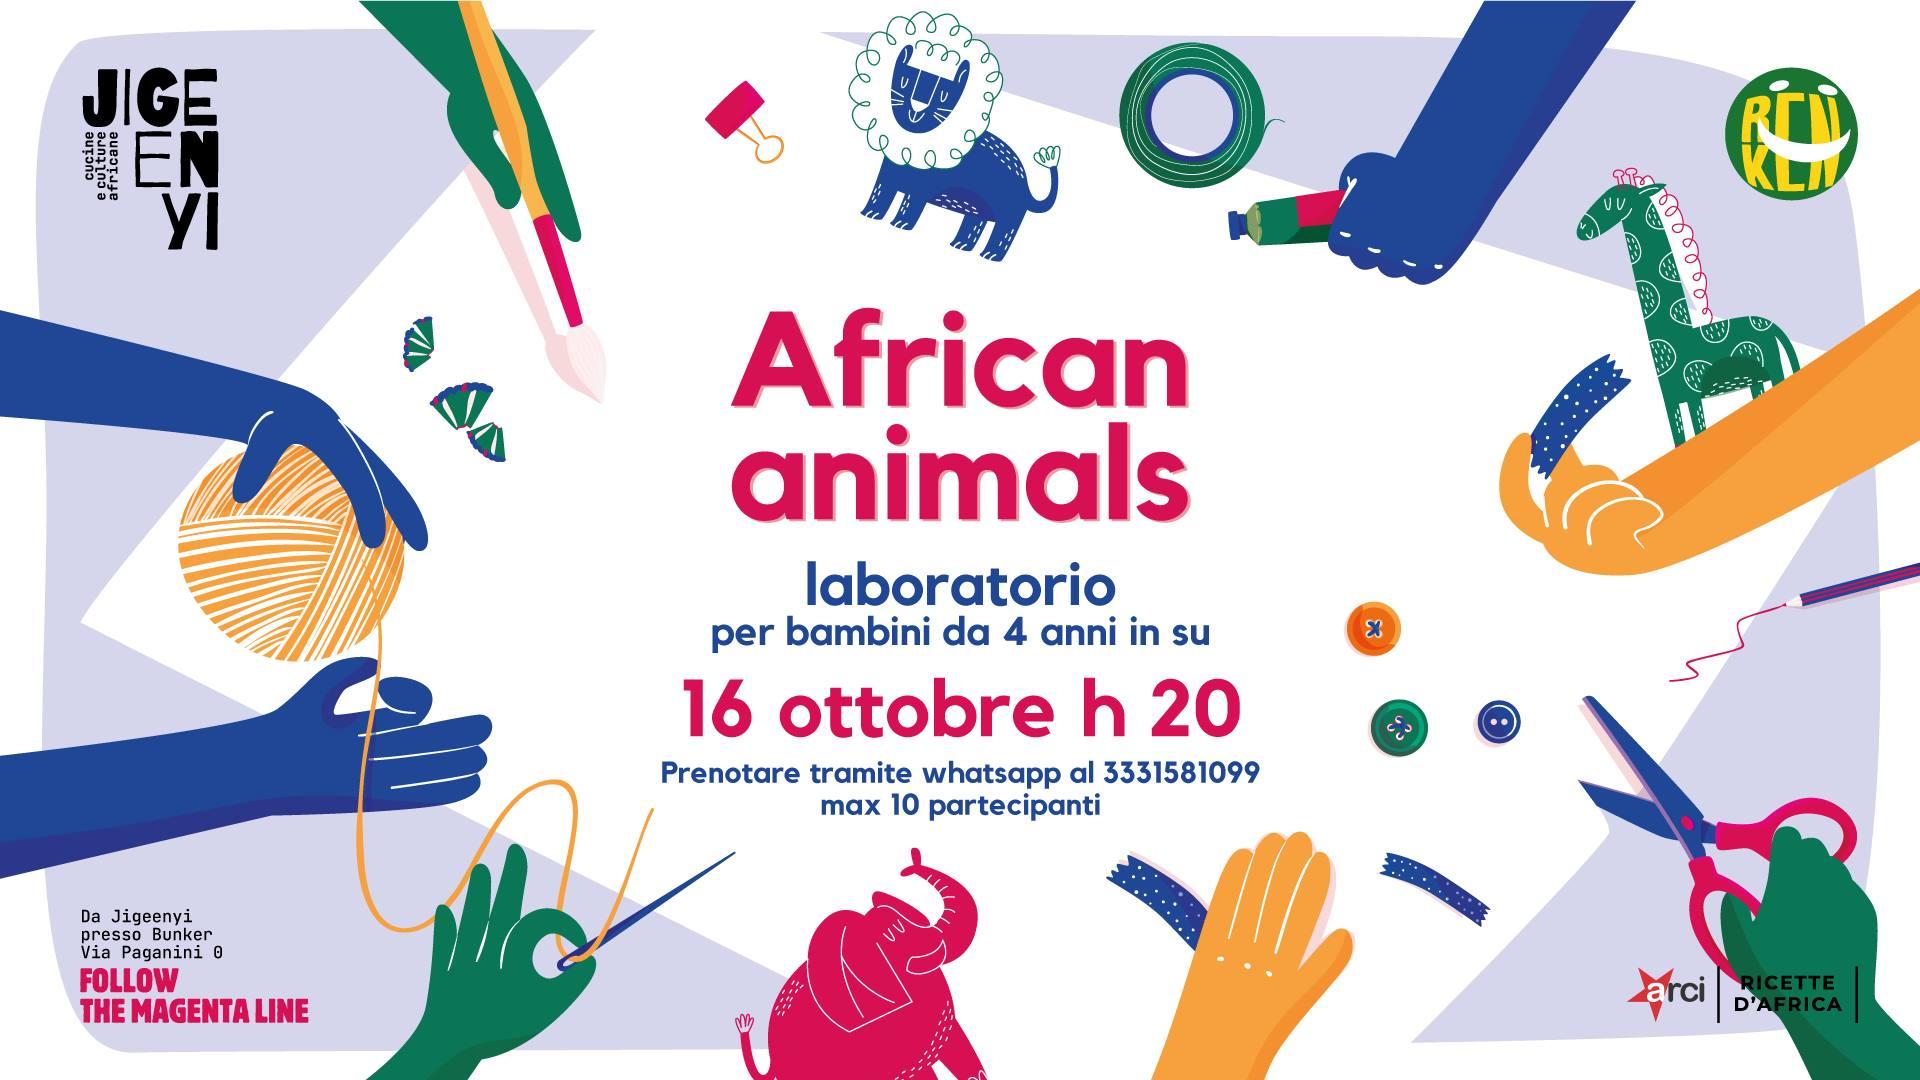 bimbi beguè african animals